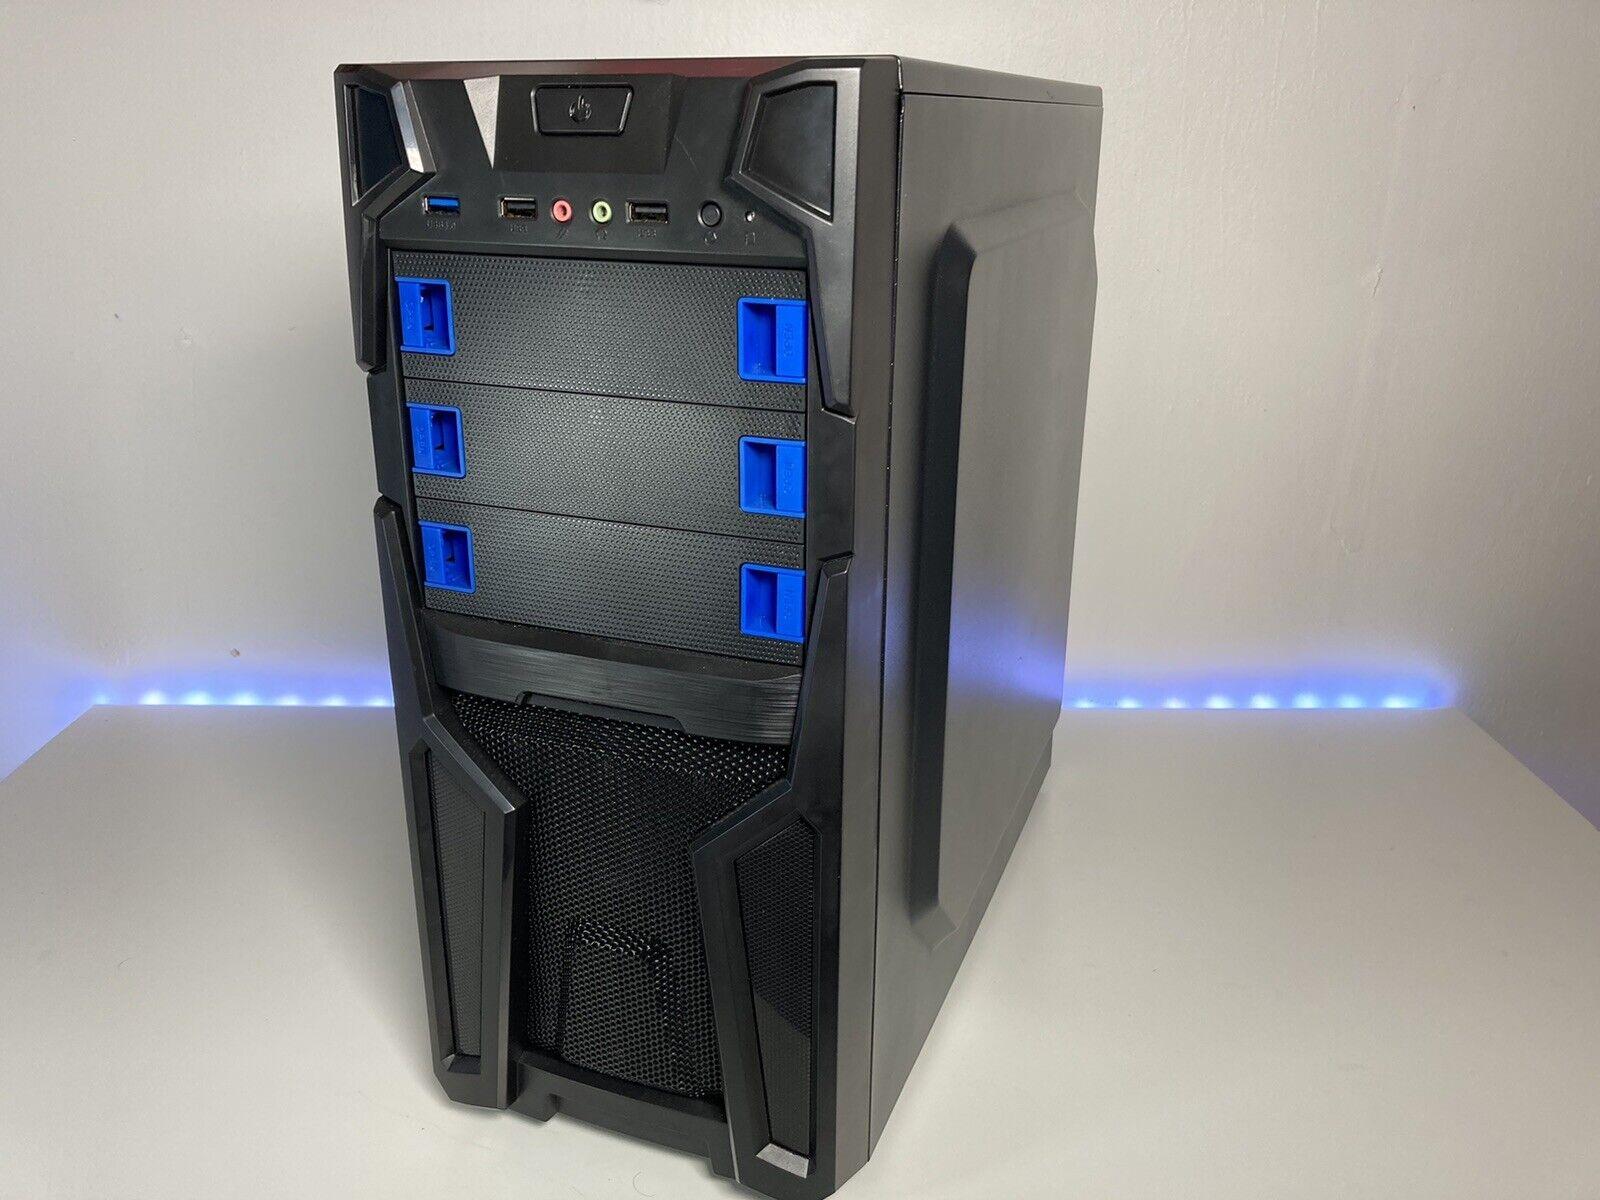 Intel i5 Gaming PC (Core i5, 16GB RAM, 120GB SSD, 1TB HDD, Windows 10)